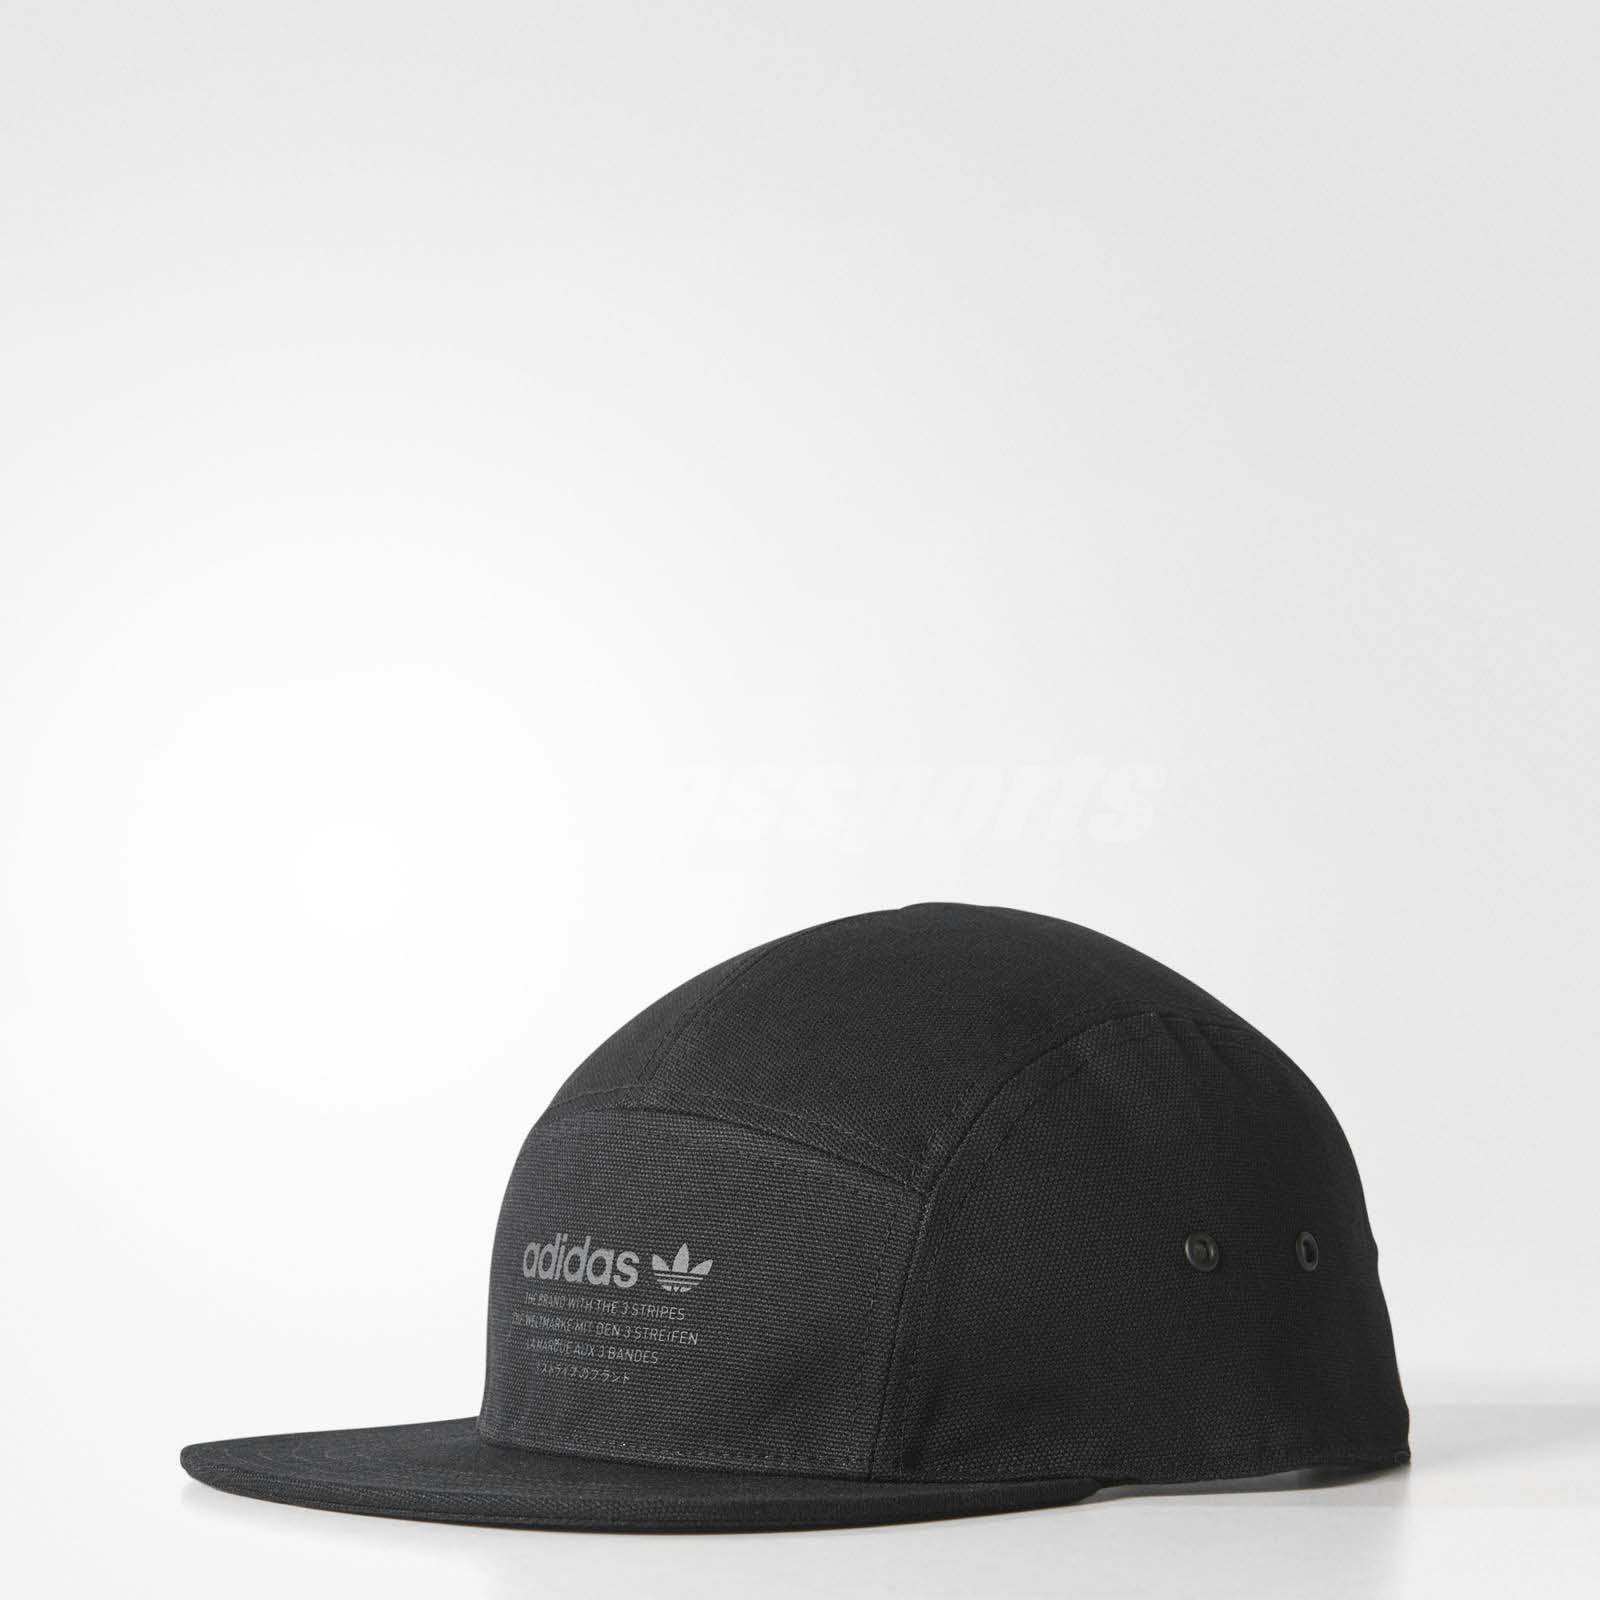 Details about adidas Unisex Originals NMD Cap Baseball Sports Hat Trefoil Running Black BR4685